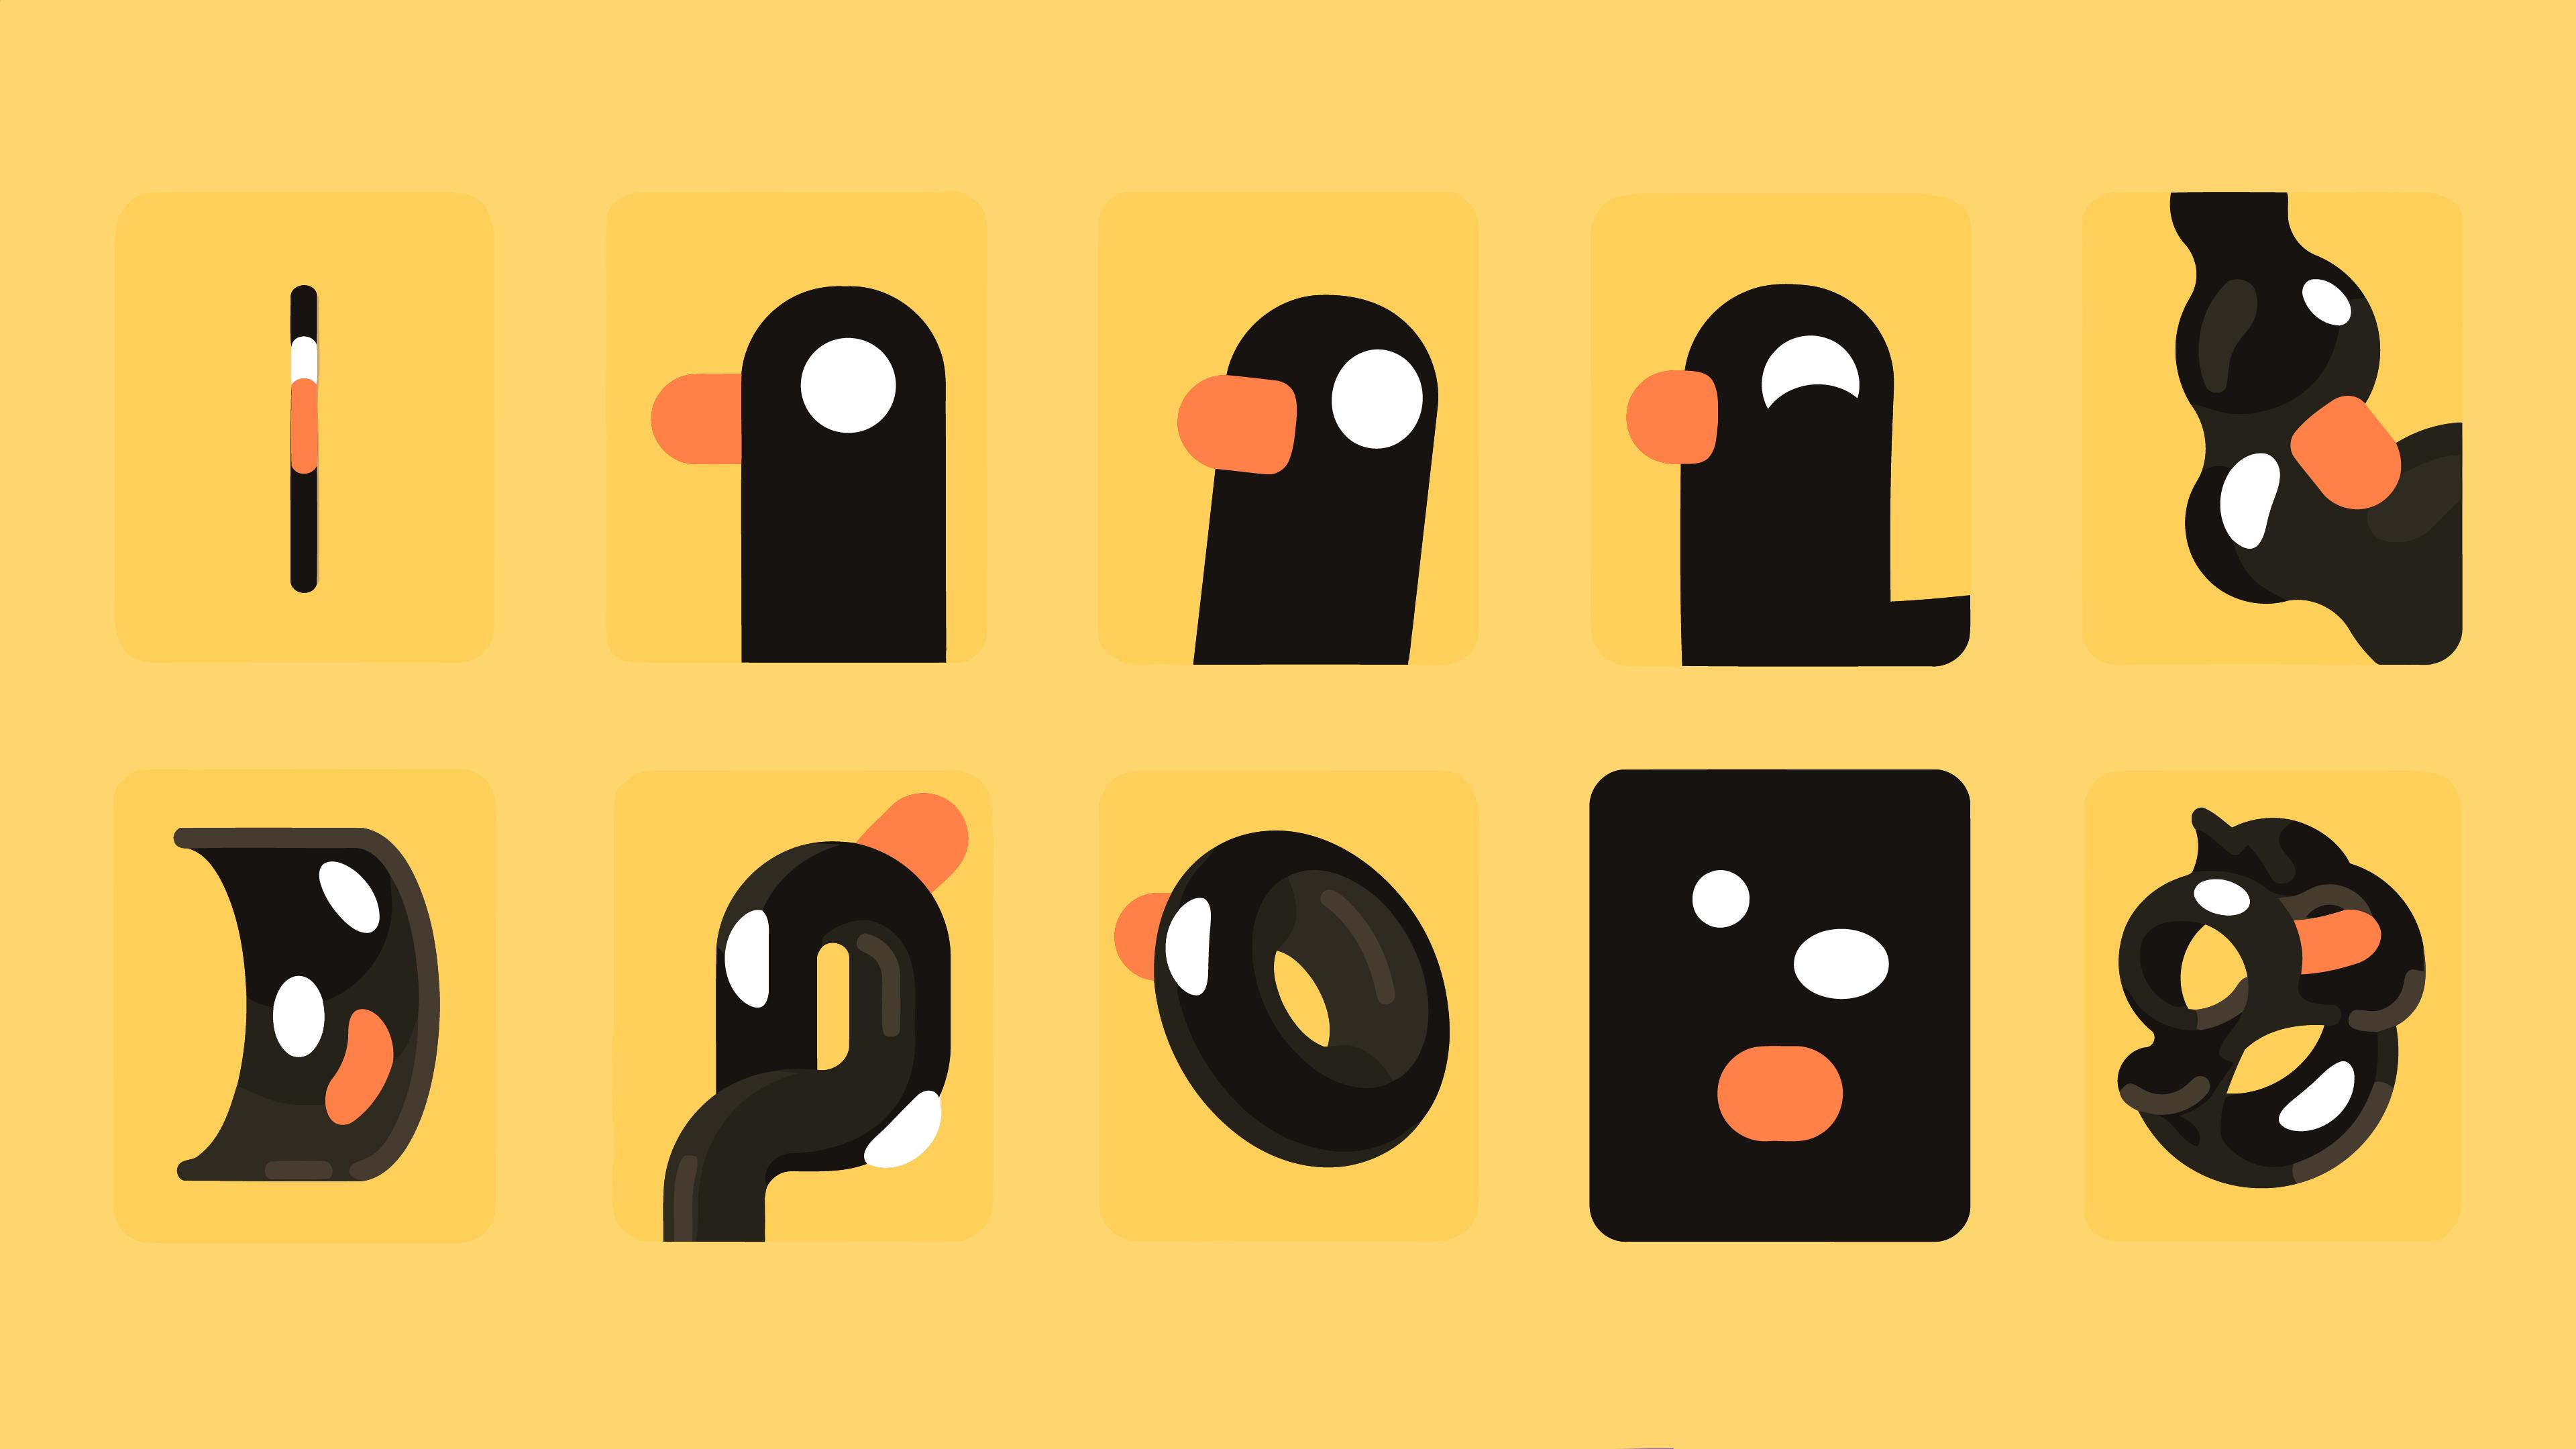 Wallpaper Kurzgesagt Duck Abstract Yellow Background